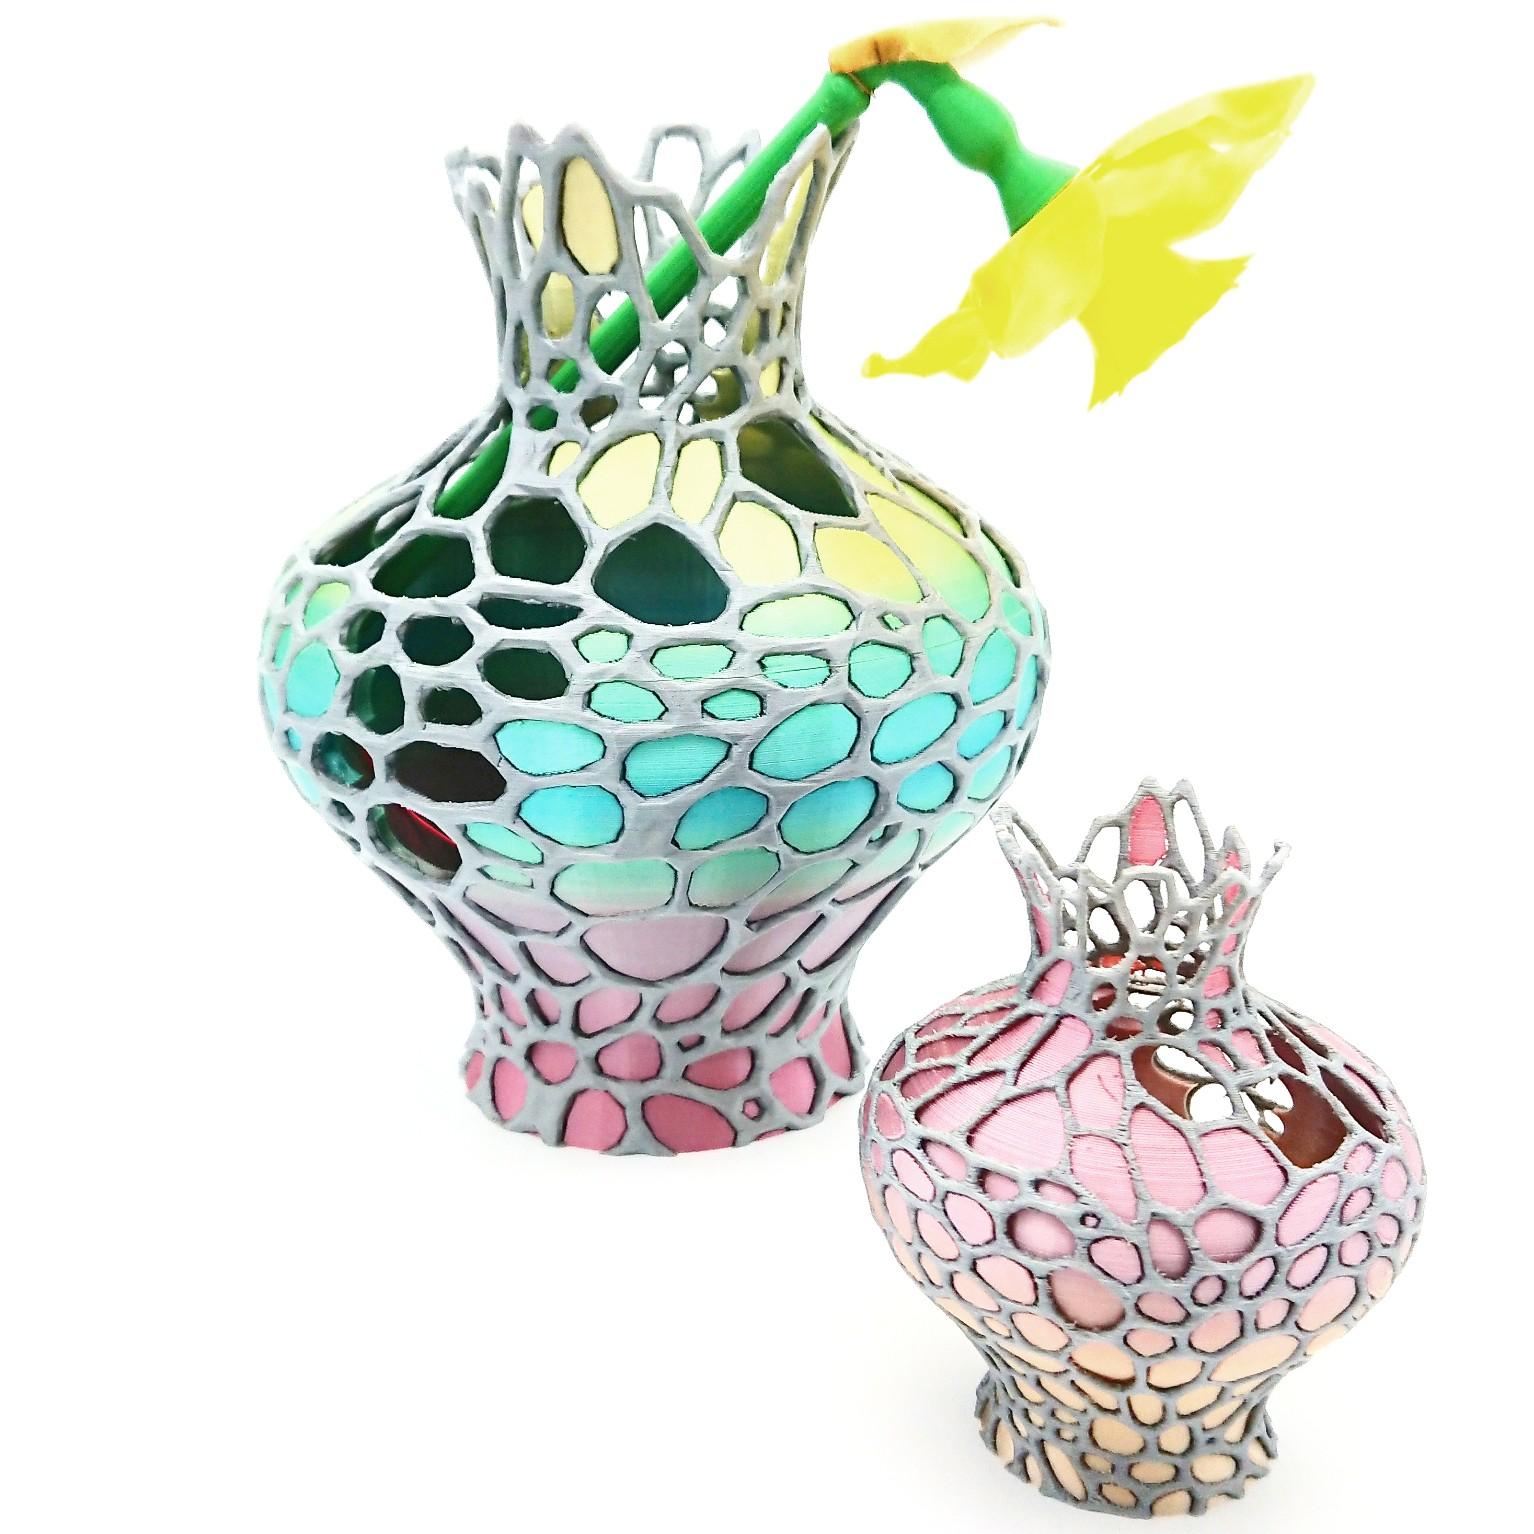 PicsArt_06-18-08.00.25.jpg Download free STL file Organic Amphora • 3D printer template, DasMia